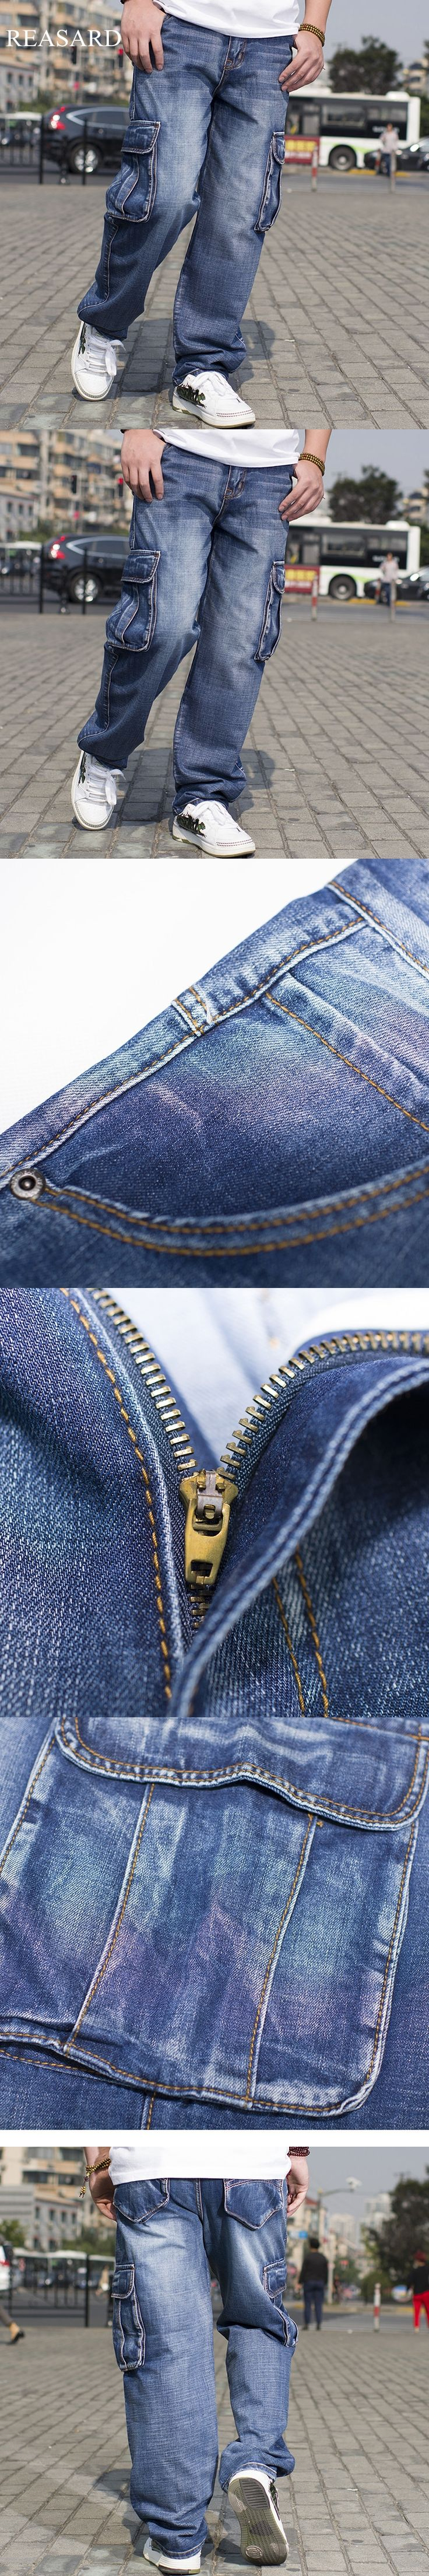 2017 Mens Cargo Jeans Pants Multi Pocket Hip Hop Designer Baggy Jeans Mens Loose Fit Casual Trousers Cotton Size 44 46 MB16248